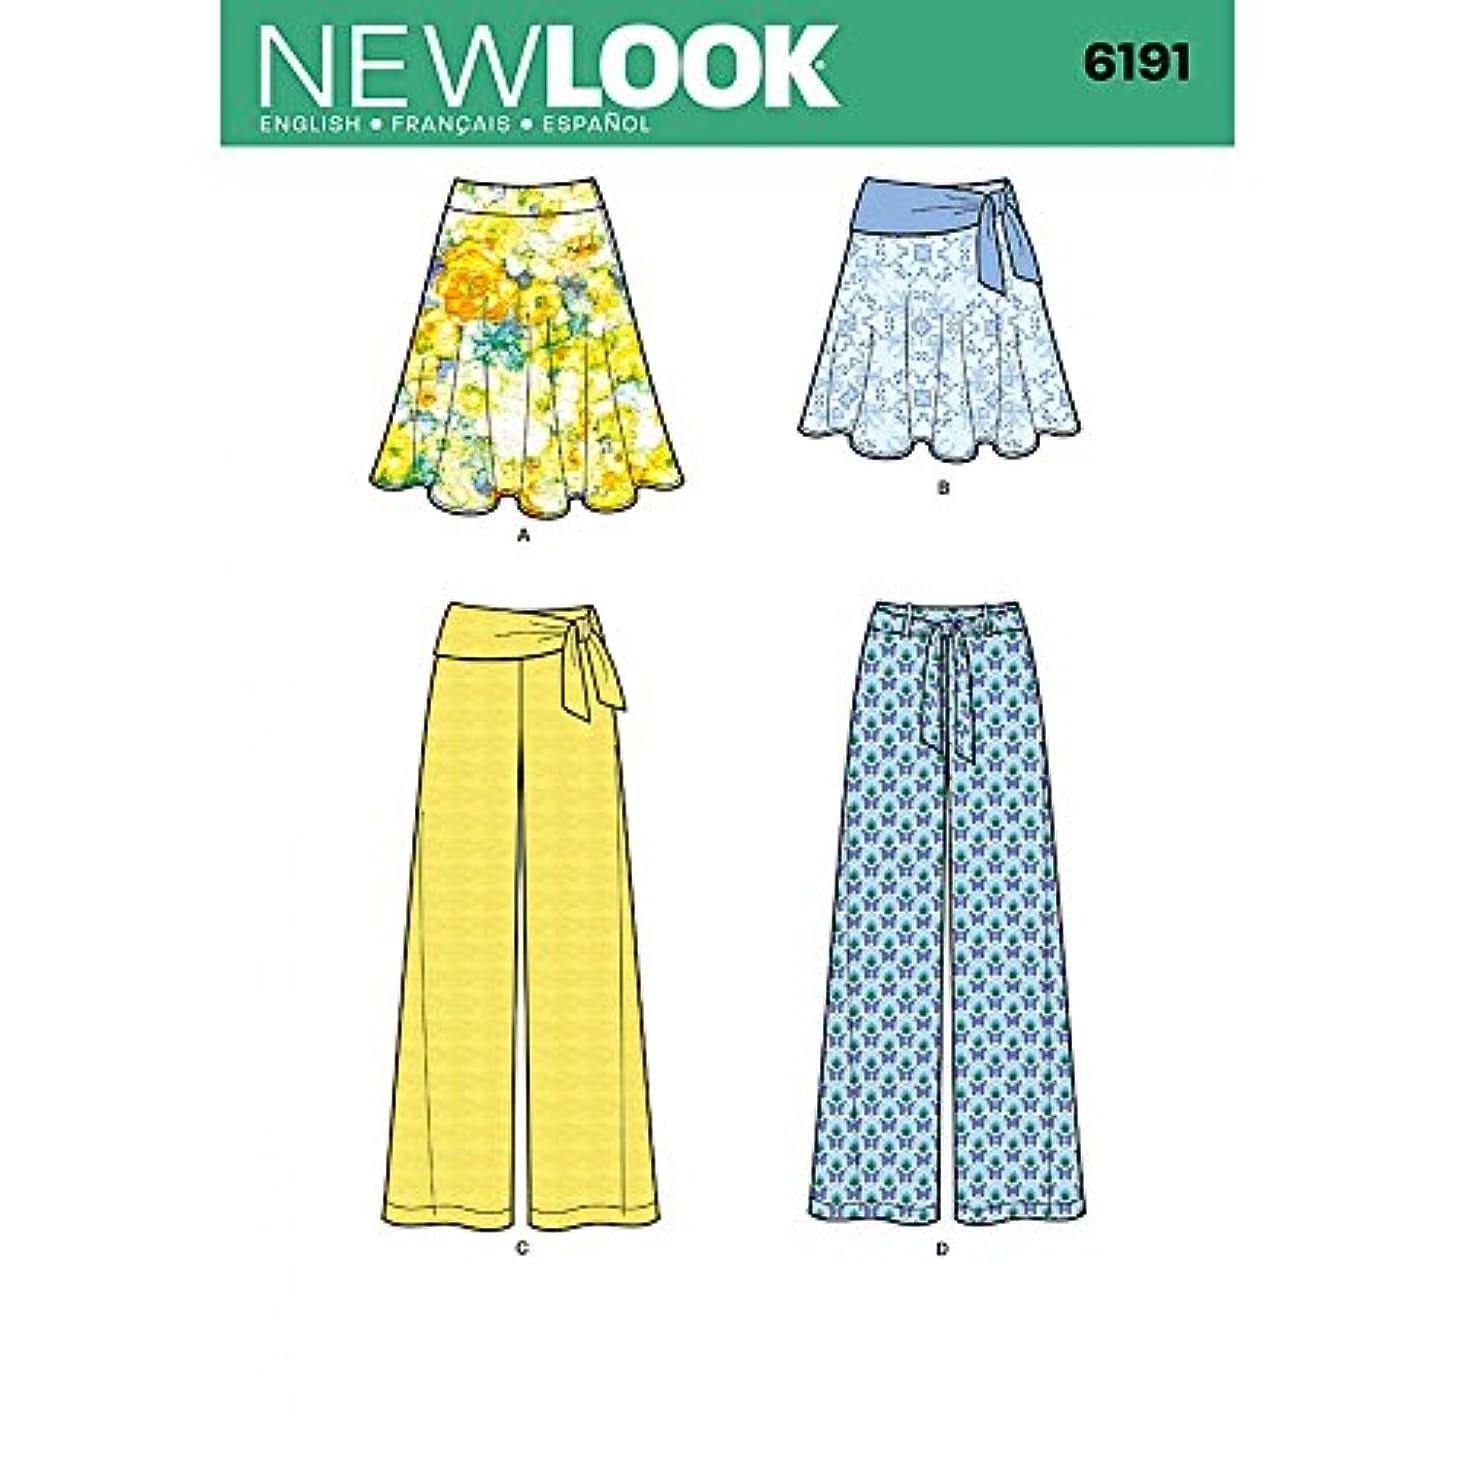 New Look Misses' Skirt, Pants and Tie Belt Pattern